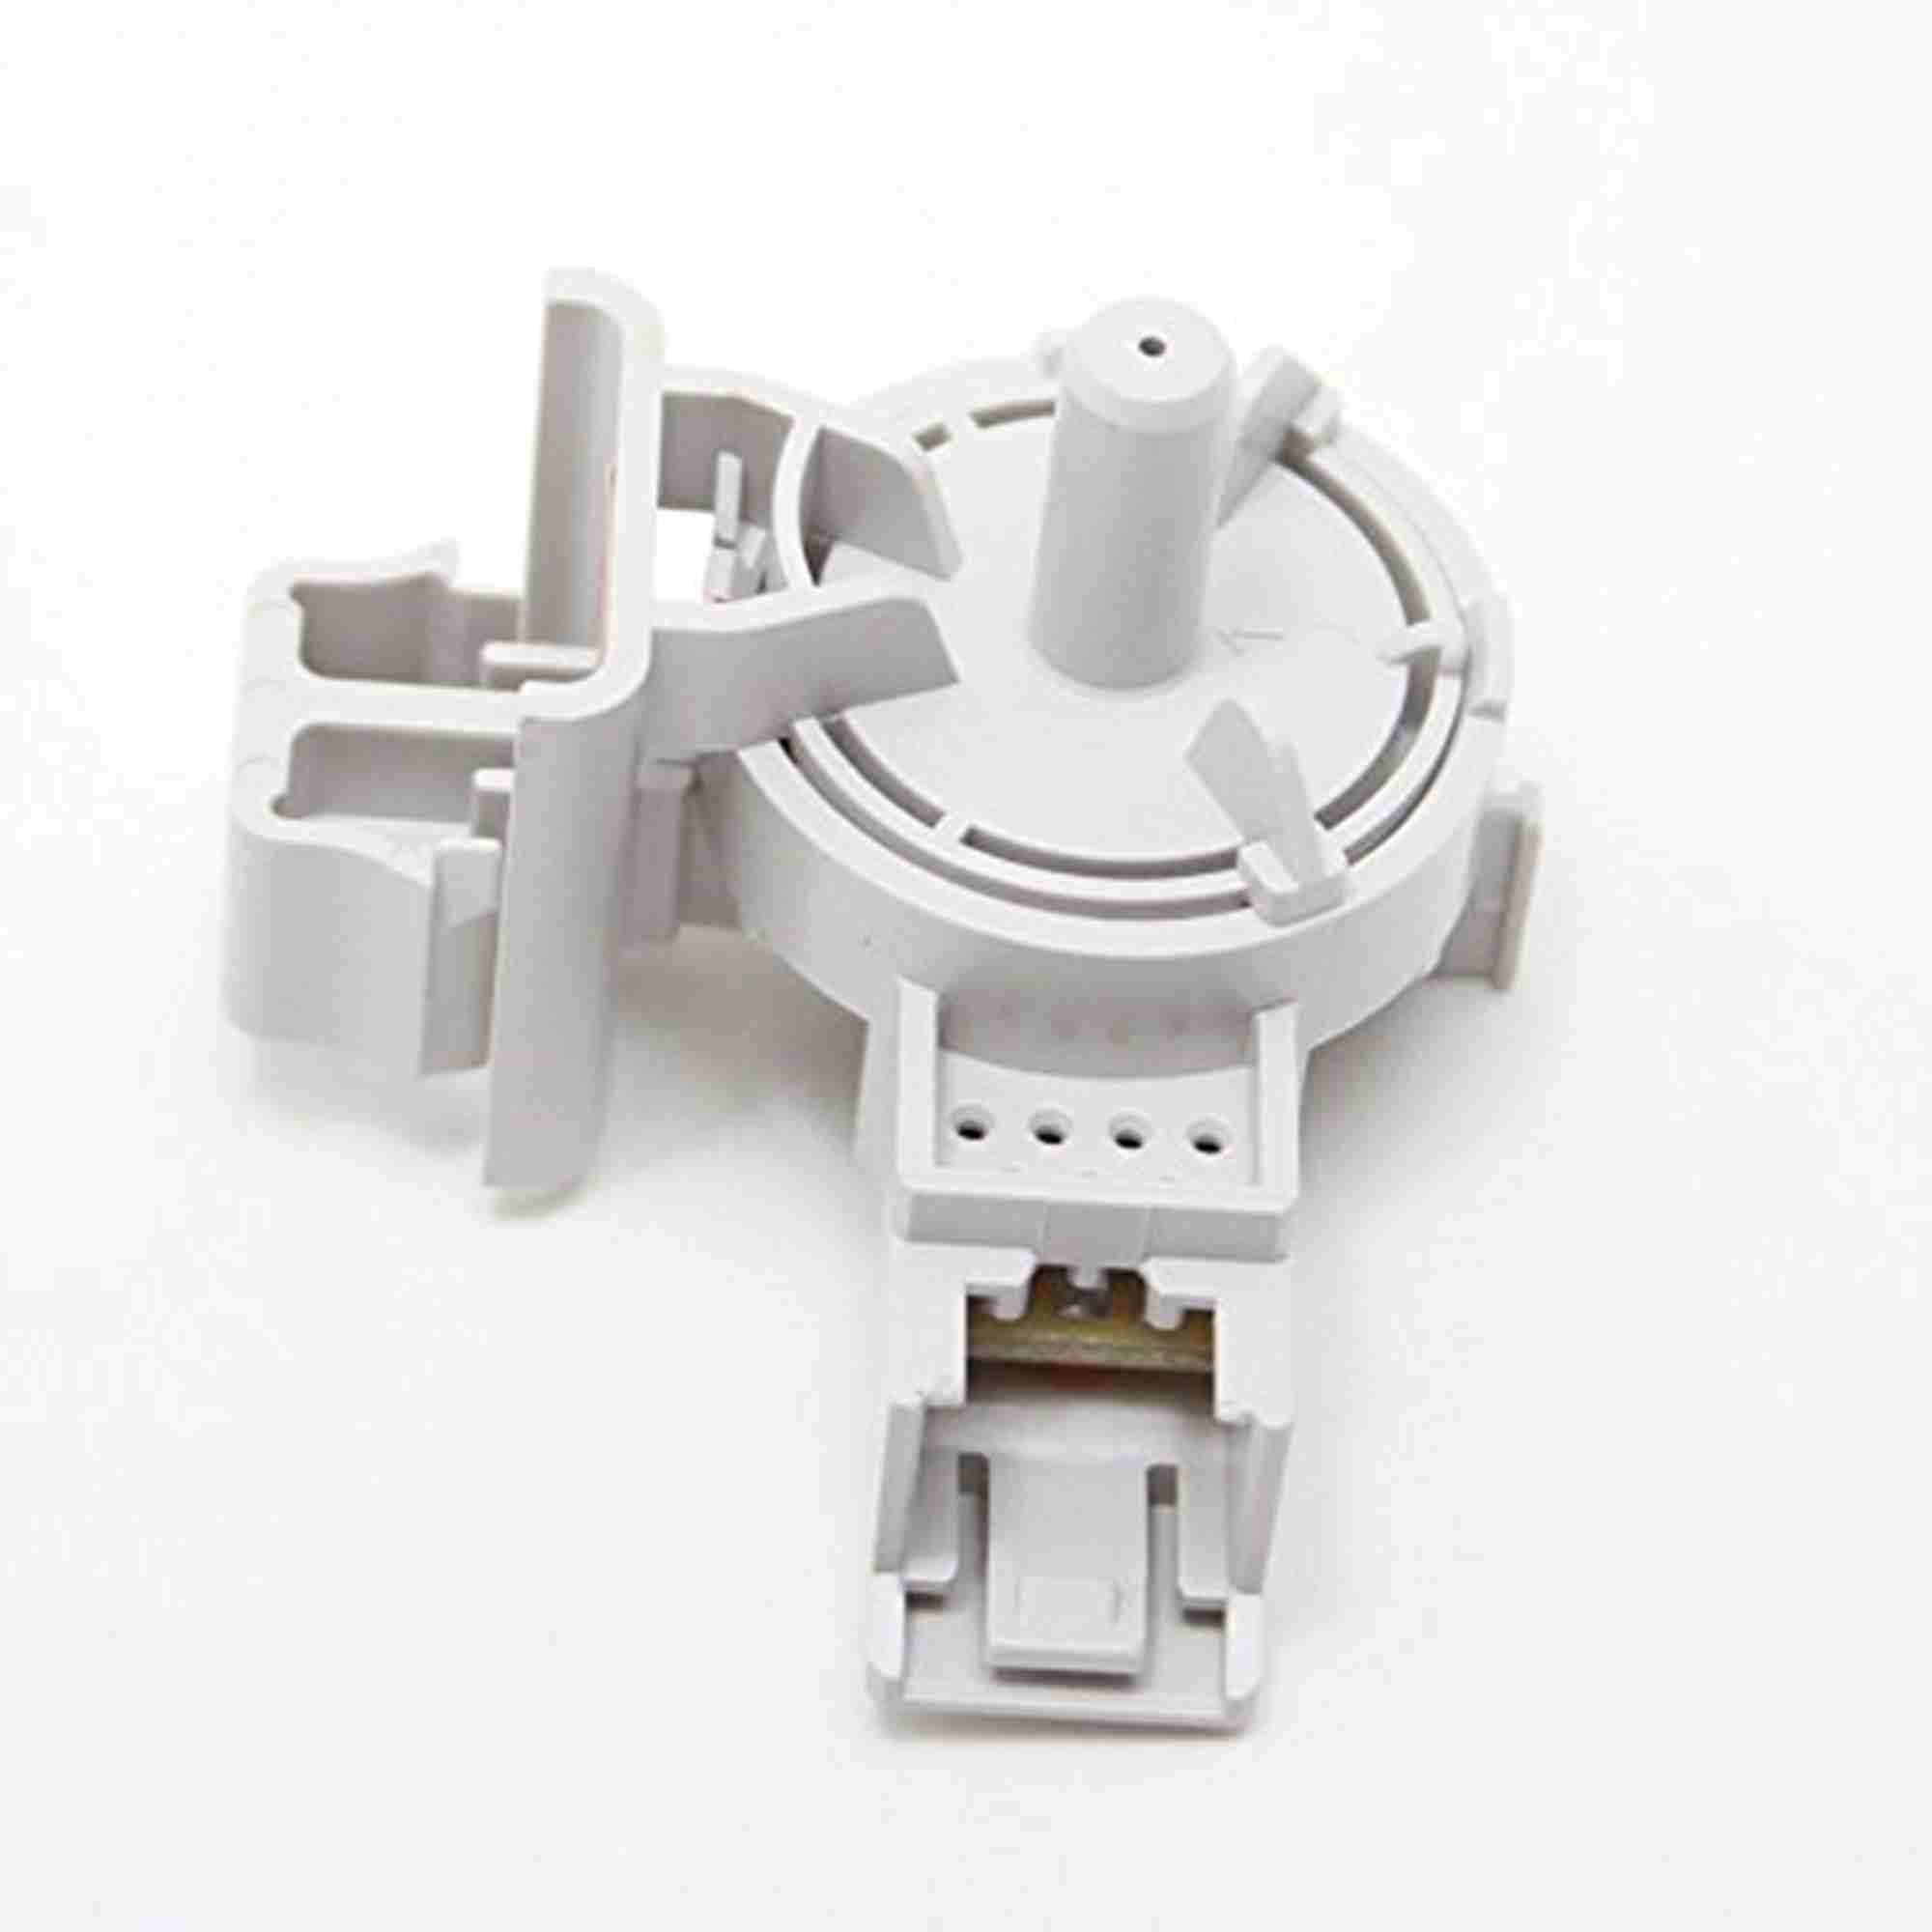 WPW10448876 For Whirlpool Washing Machine Pressure Switch